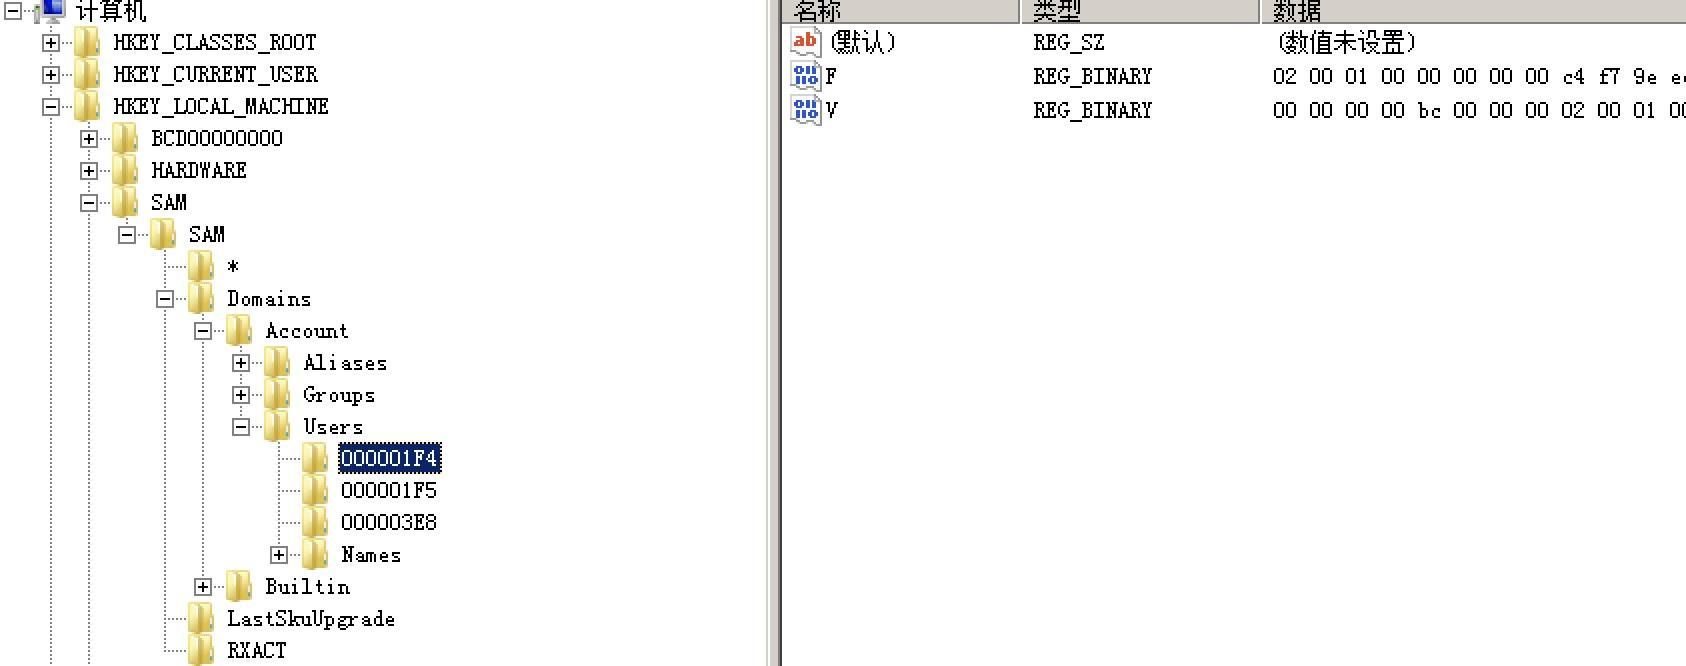 SAM database